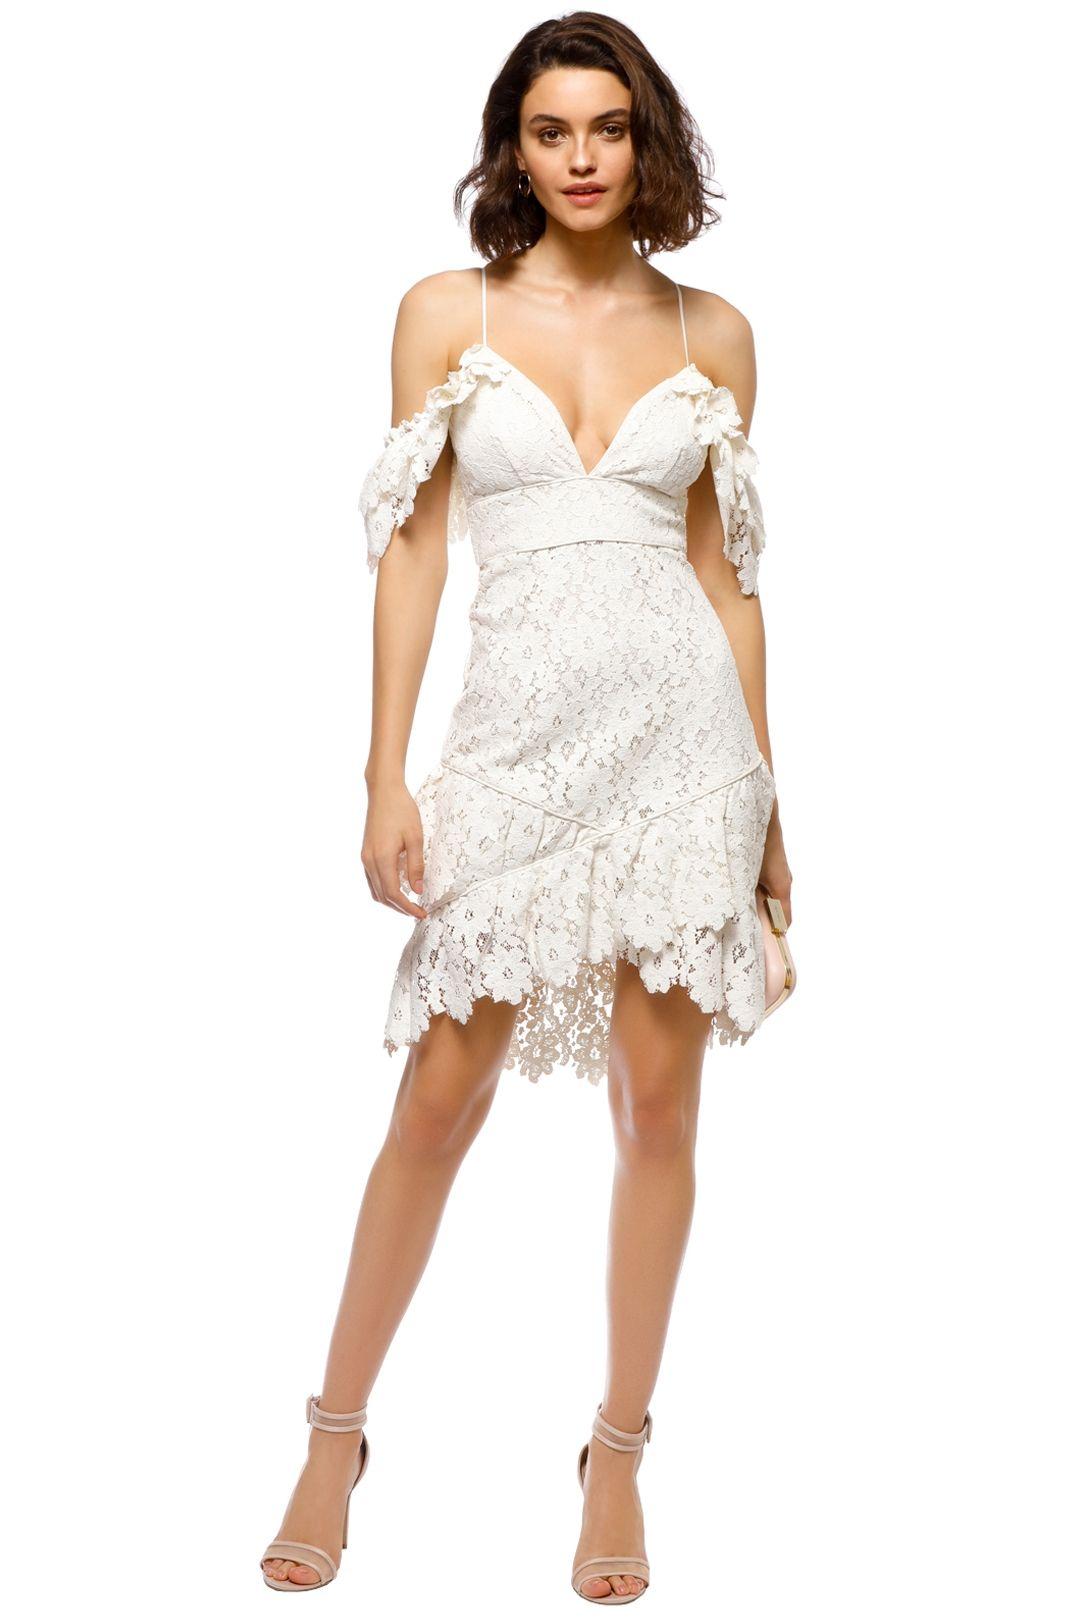 Saylor - Dana Dress - White - Front